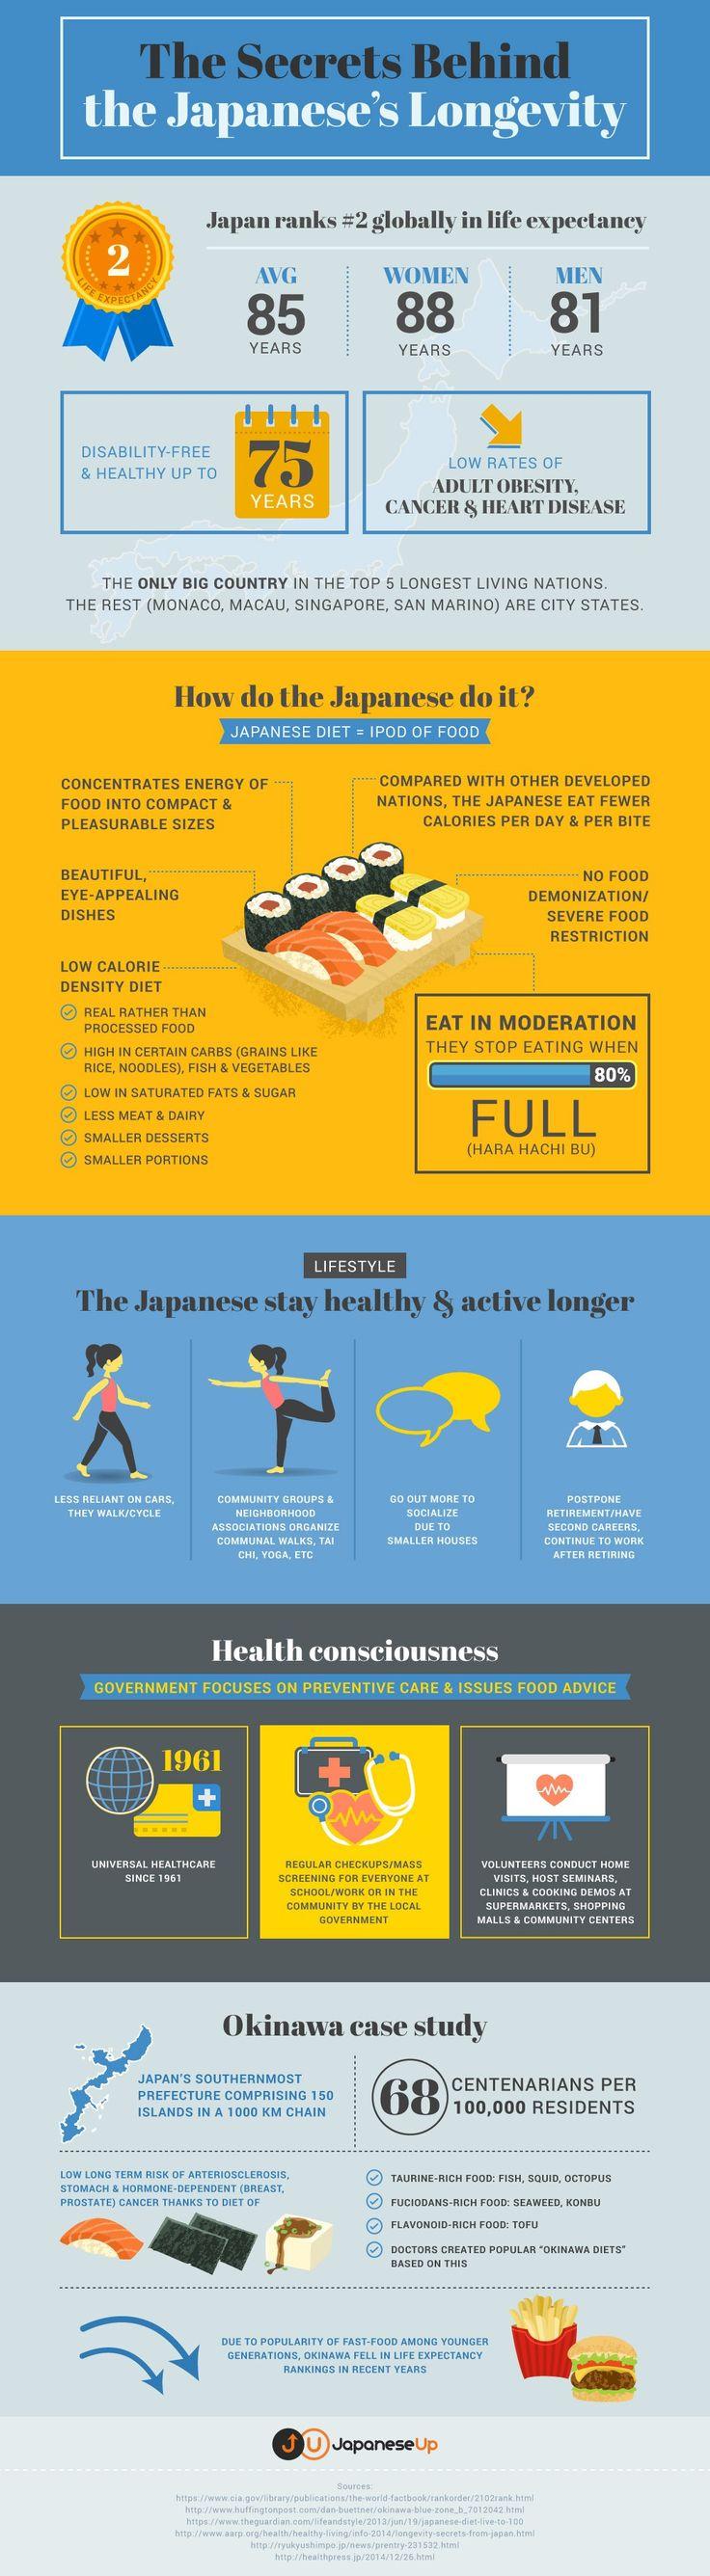 Longevity Diet: The Secrets Behind the Japanese's Longevity